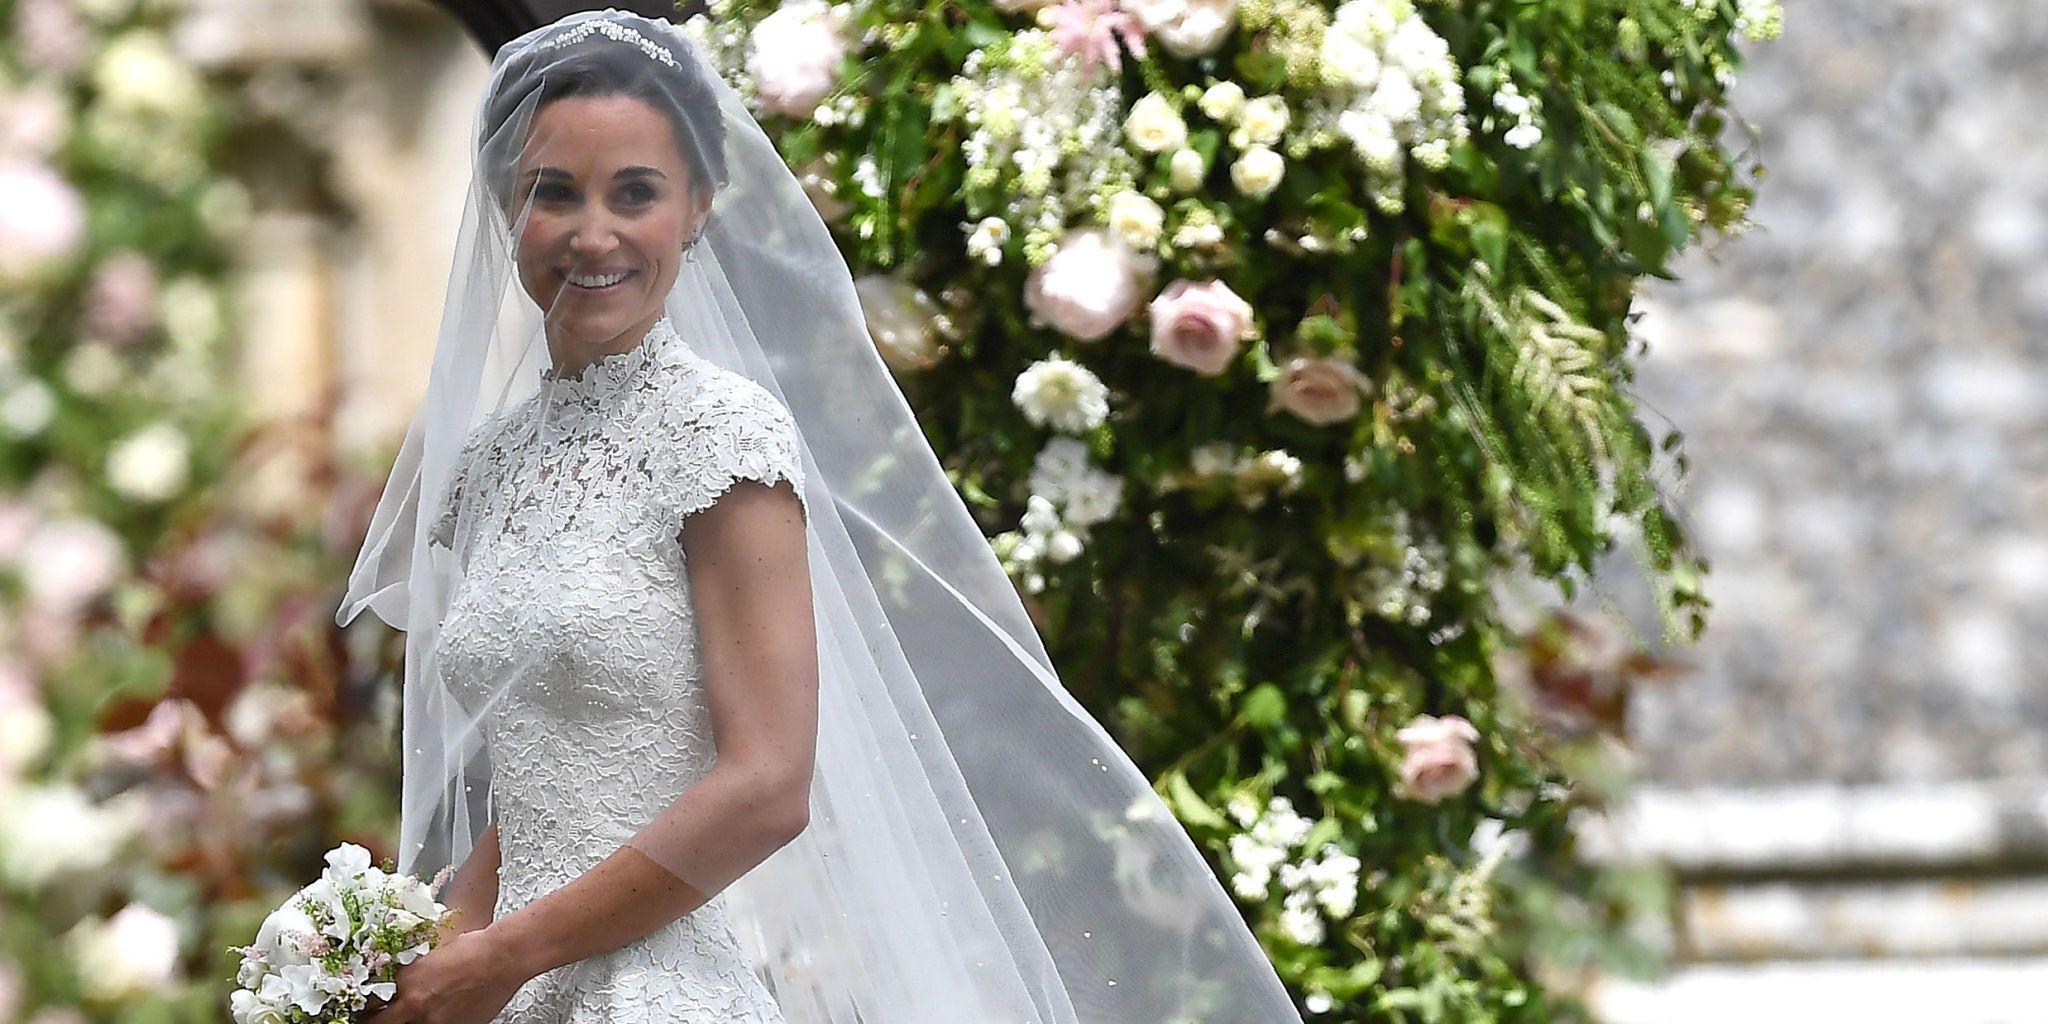 The Best Ever Celebrity Wedding Dresses